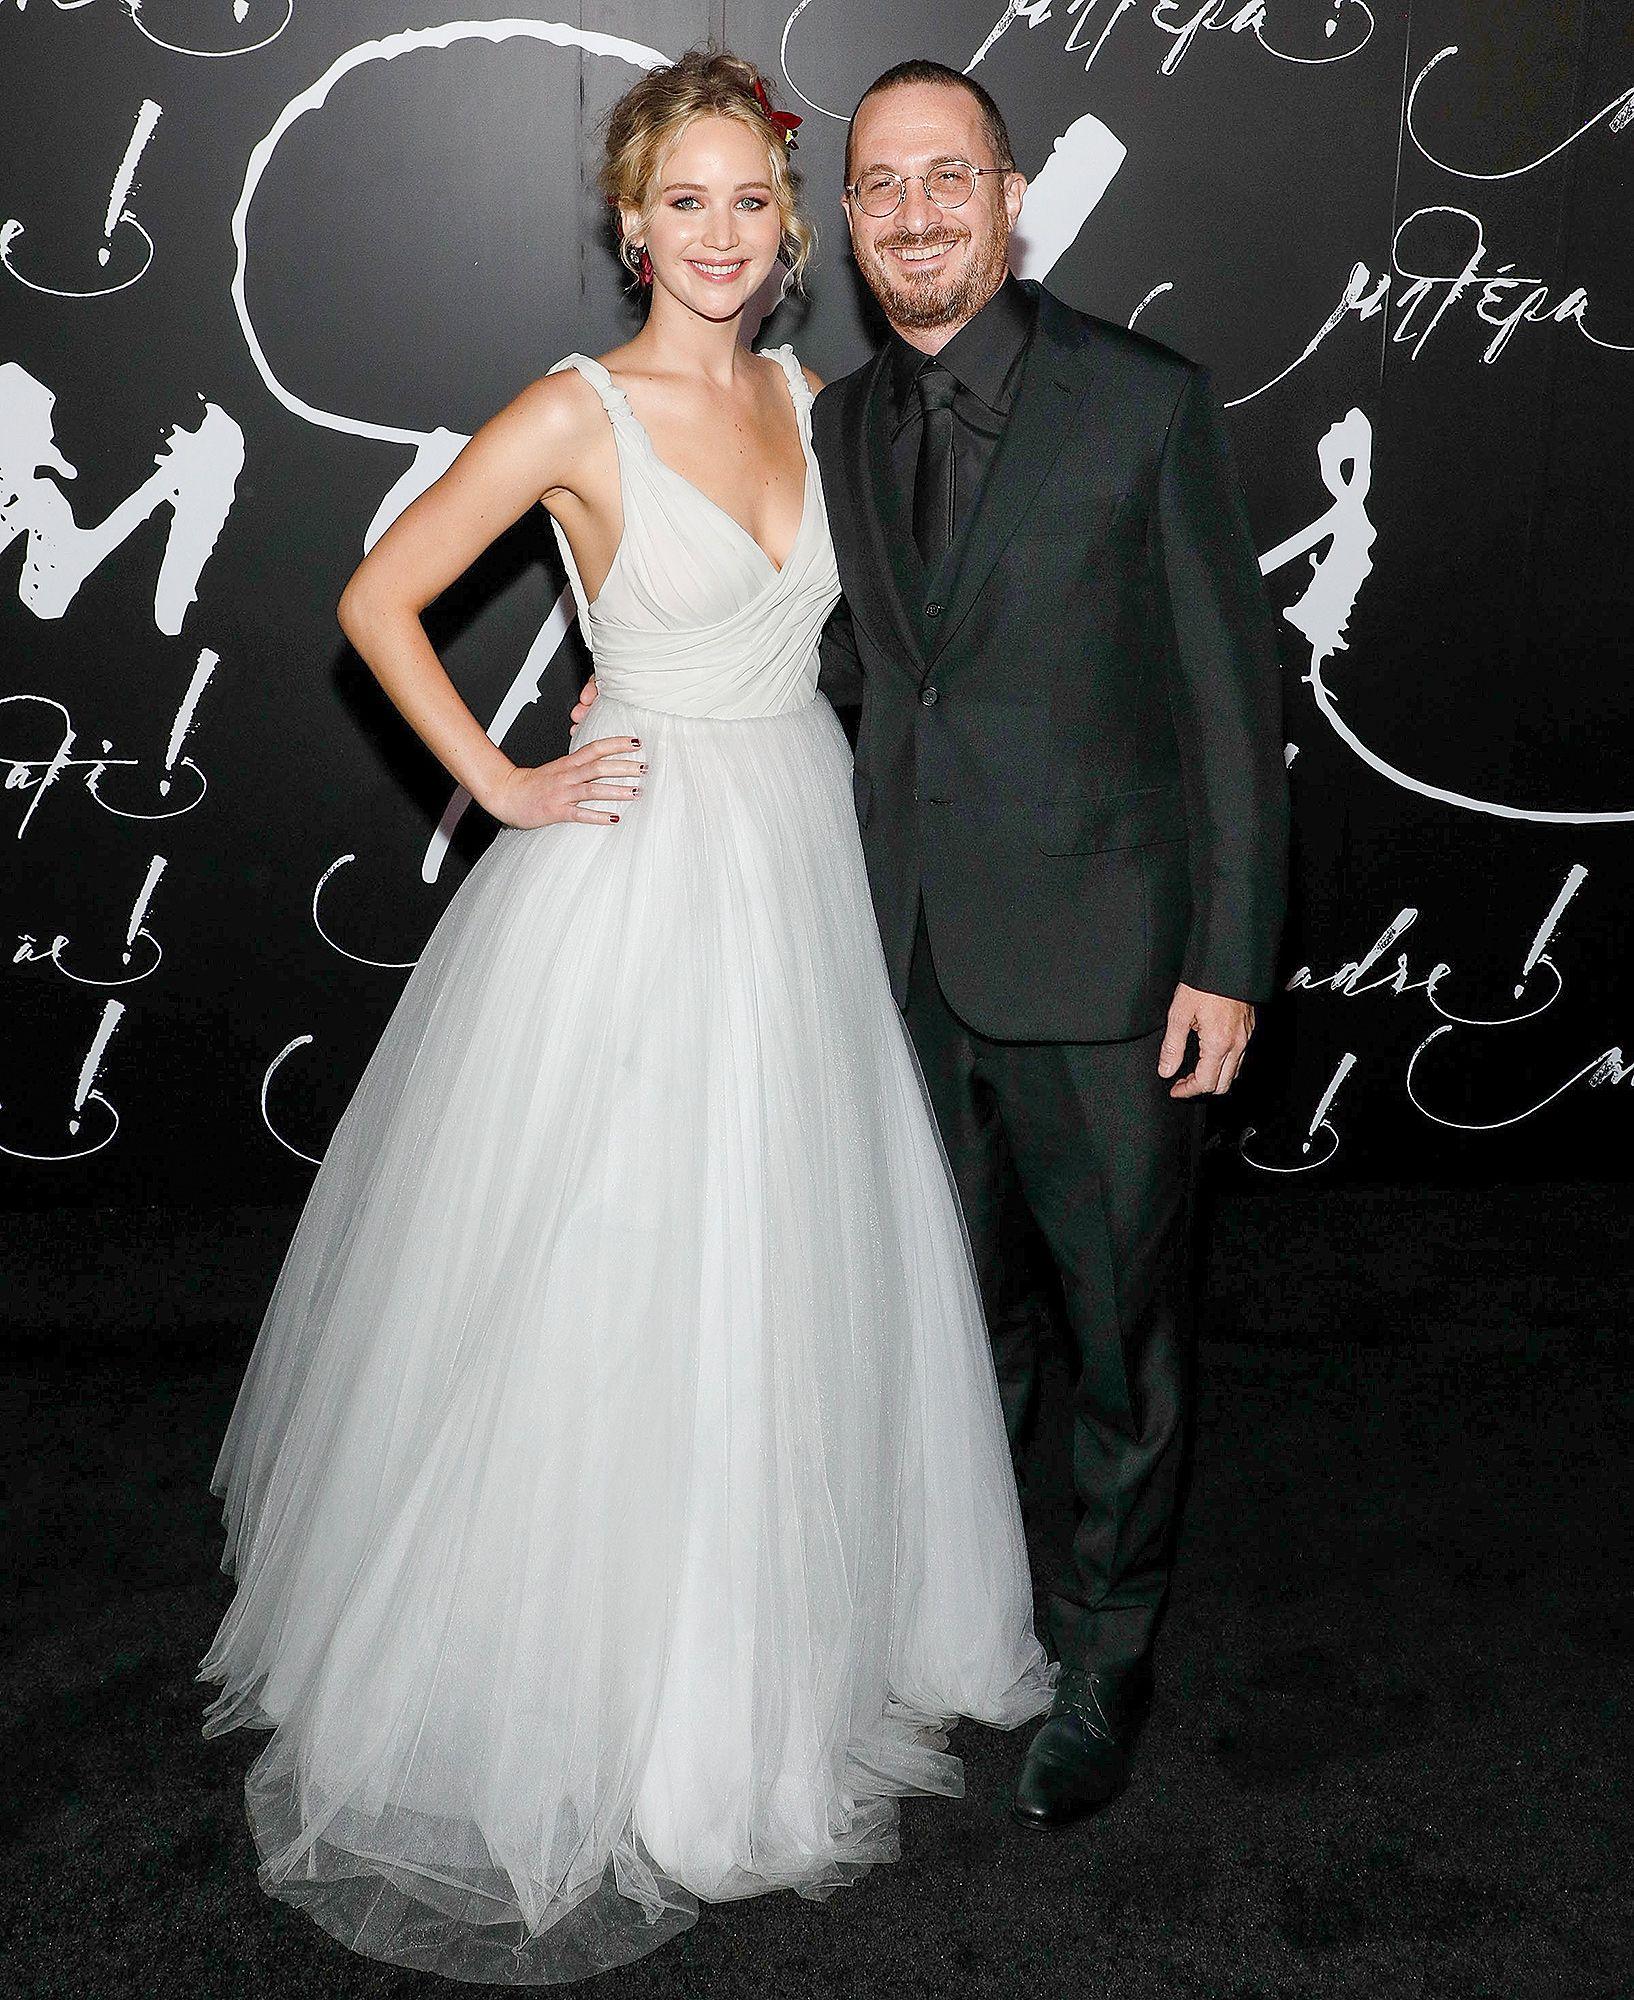 Jennifer Lawrence And Darren Aronofsky Split After A Year Together In 2020 Best Wedding Dresses Wedding Dresses Jennifer Aniston Wedding Dress